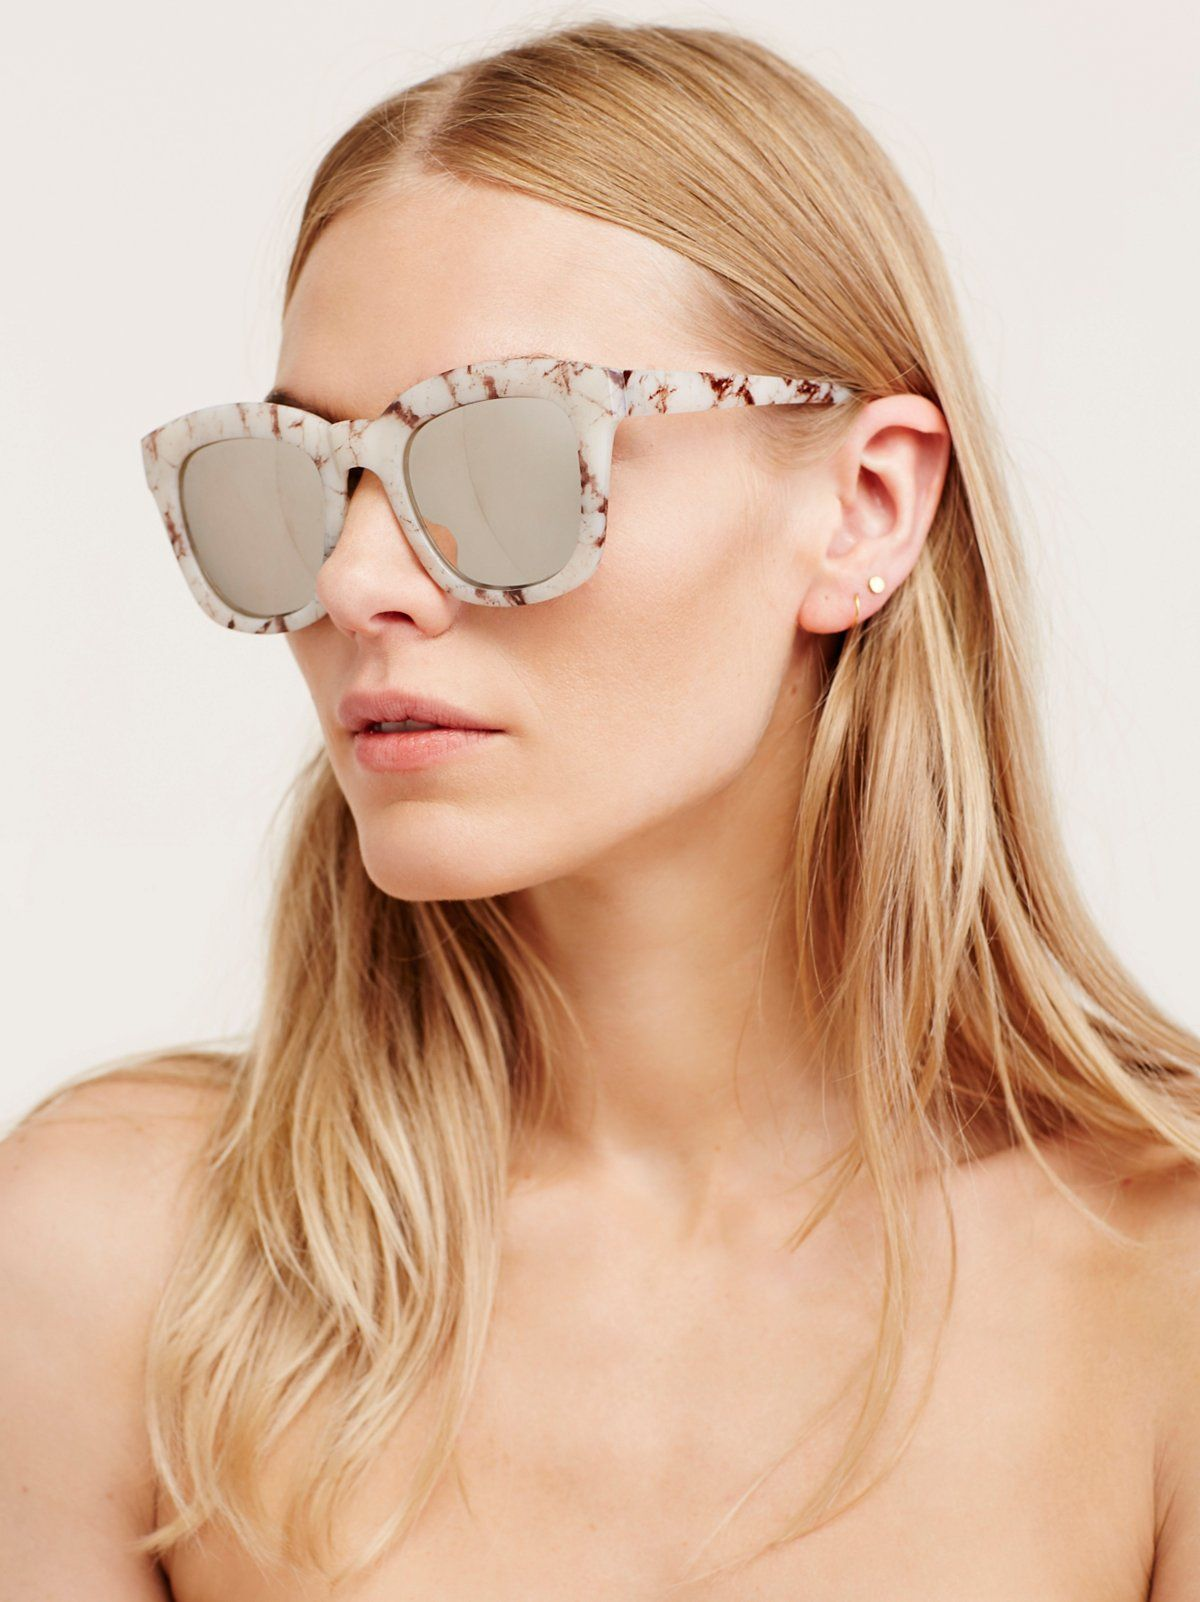 a07ba5dd936 Kensington sunglasses